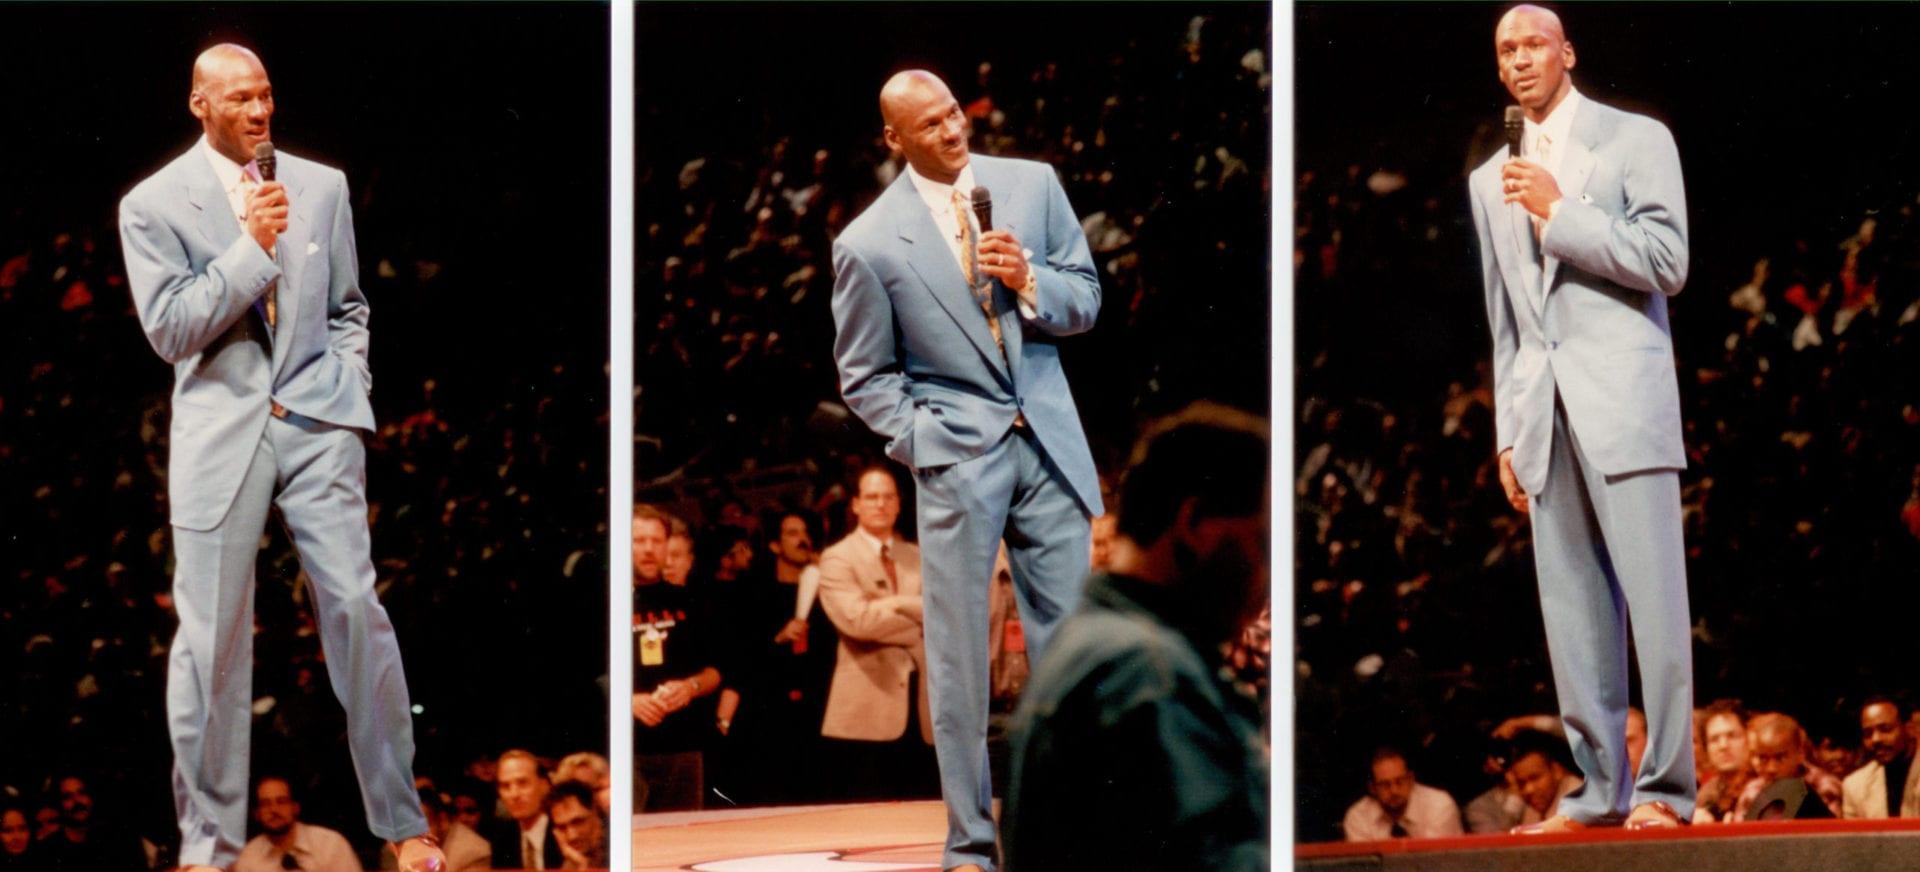 A three split images of Michael Jordan